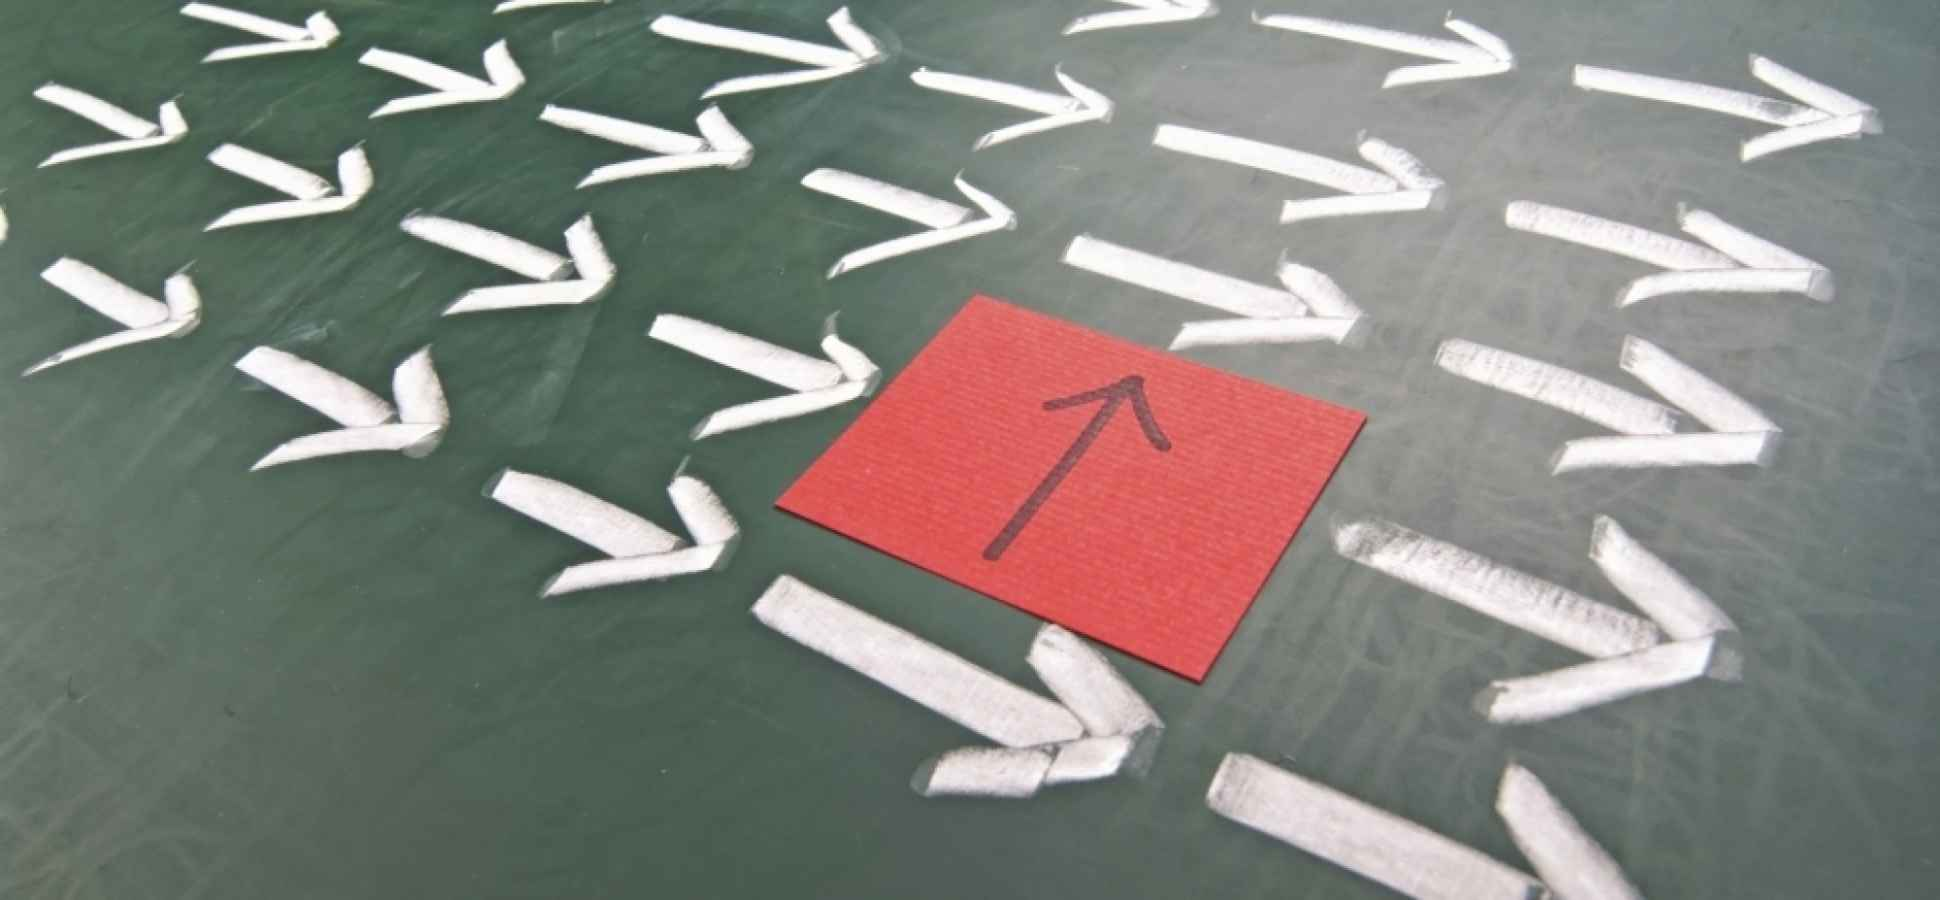 5 Tips for Effectively Managing Change